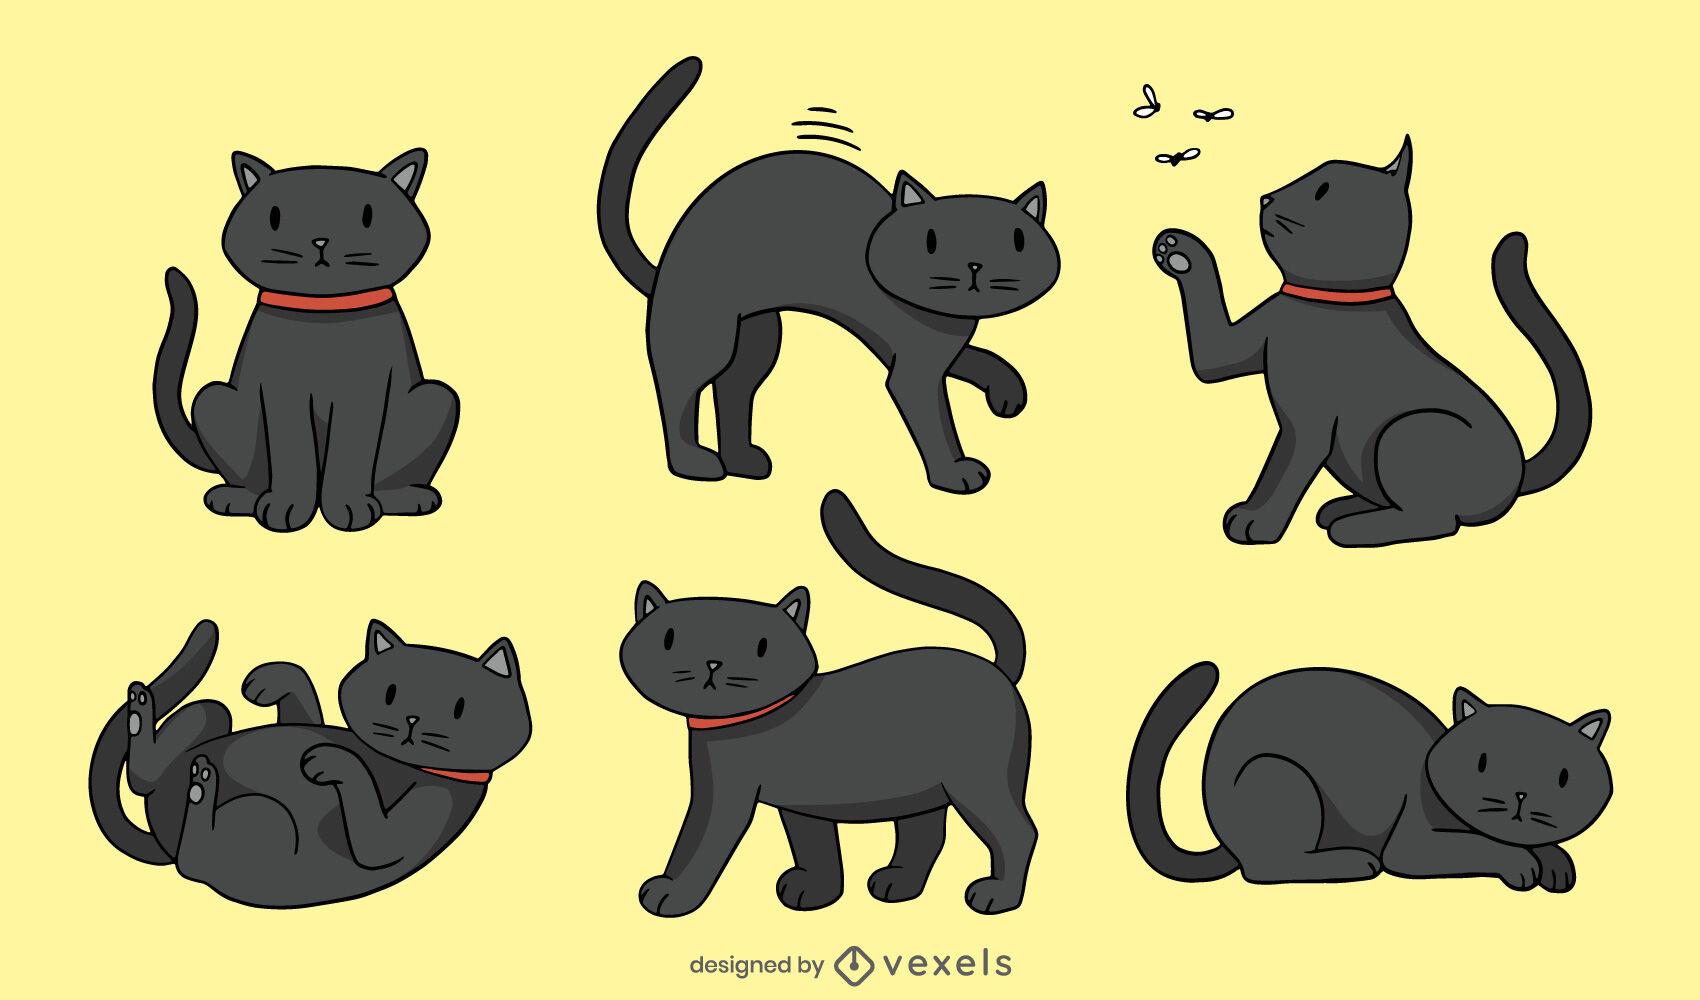 Nettes schwarzes Katzenillustrationsset